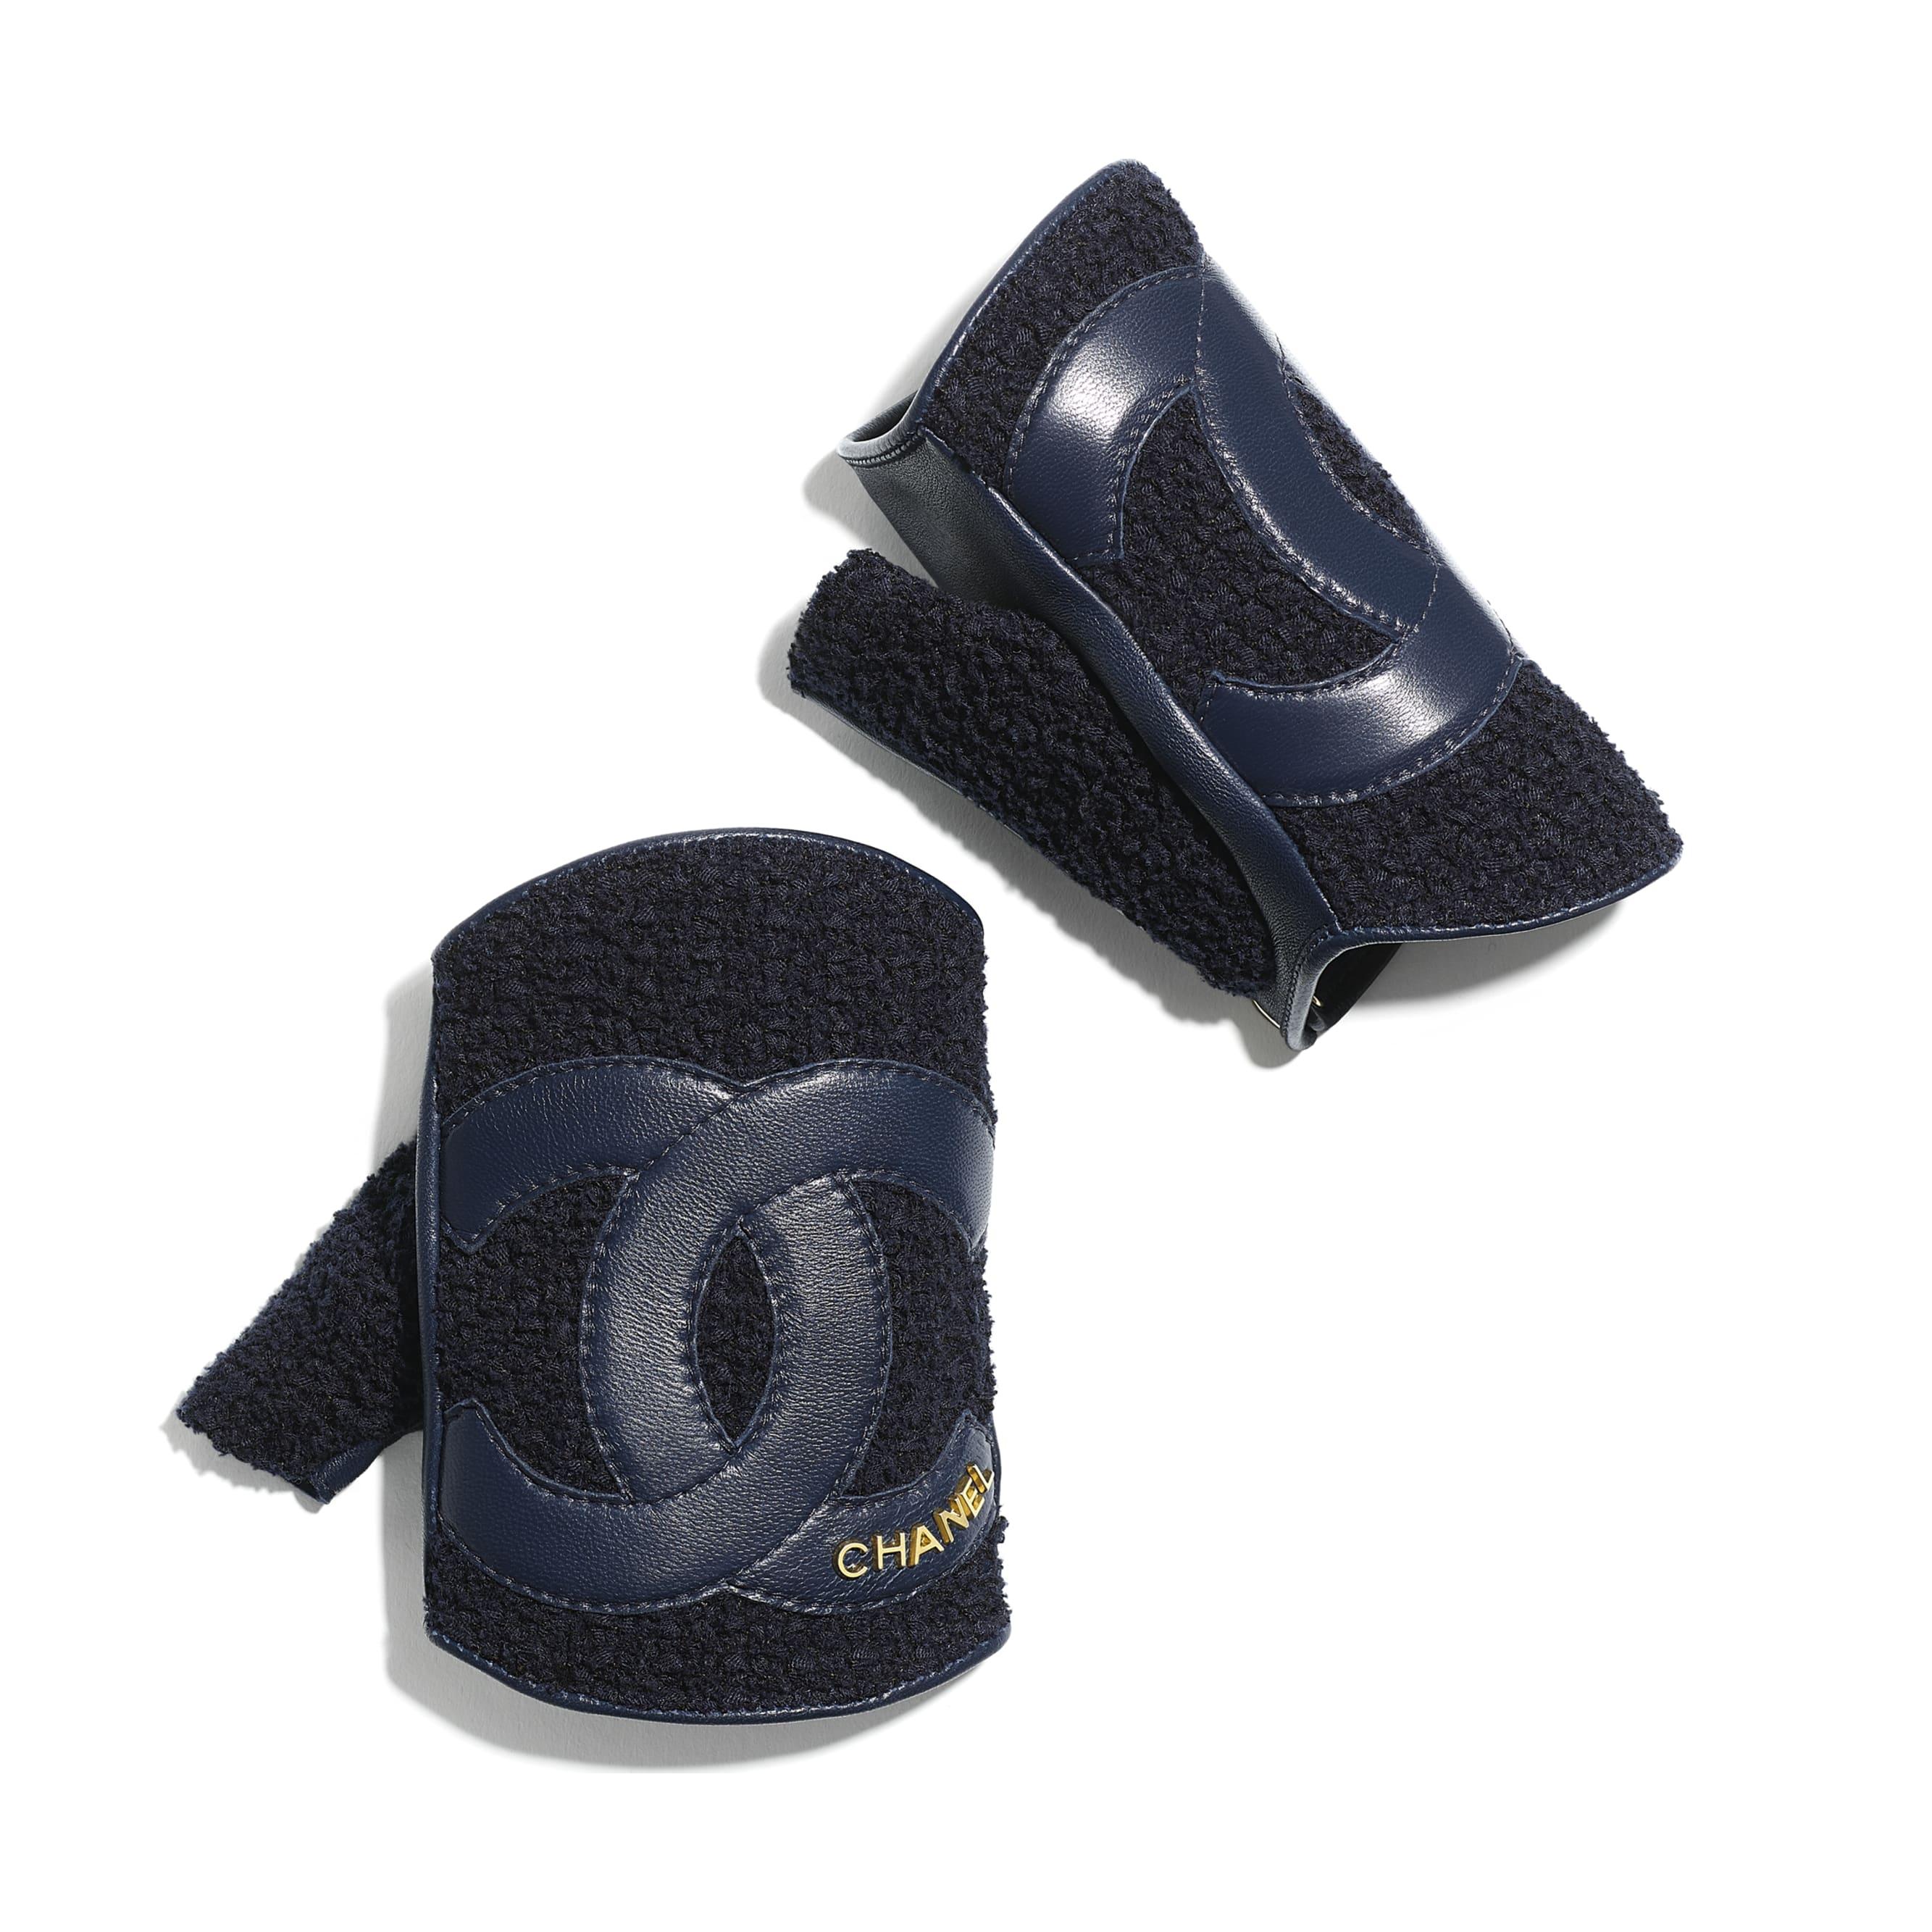 Gloves - Navy Blue - Tweed & Lambskin - CHANEL - Alternative view - see standard sized version